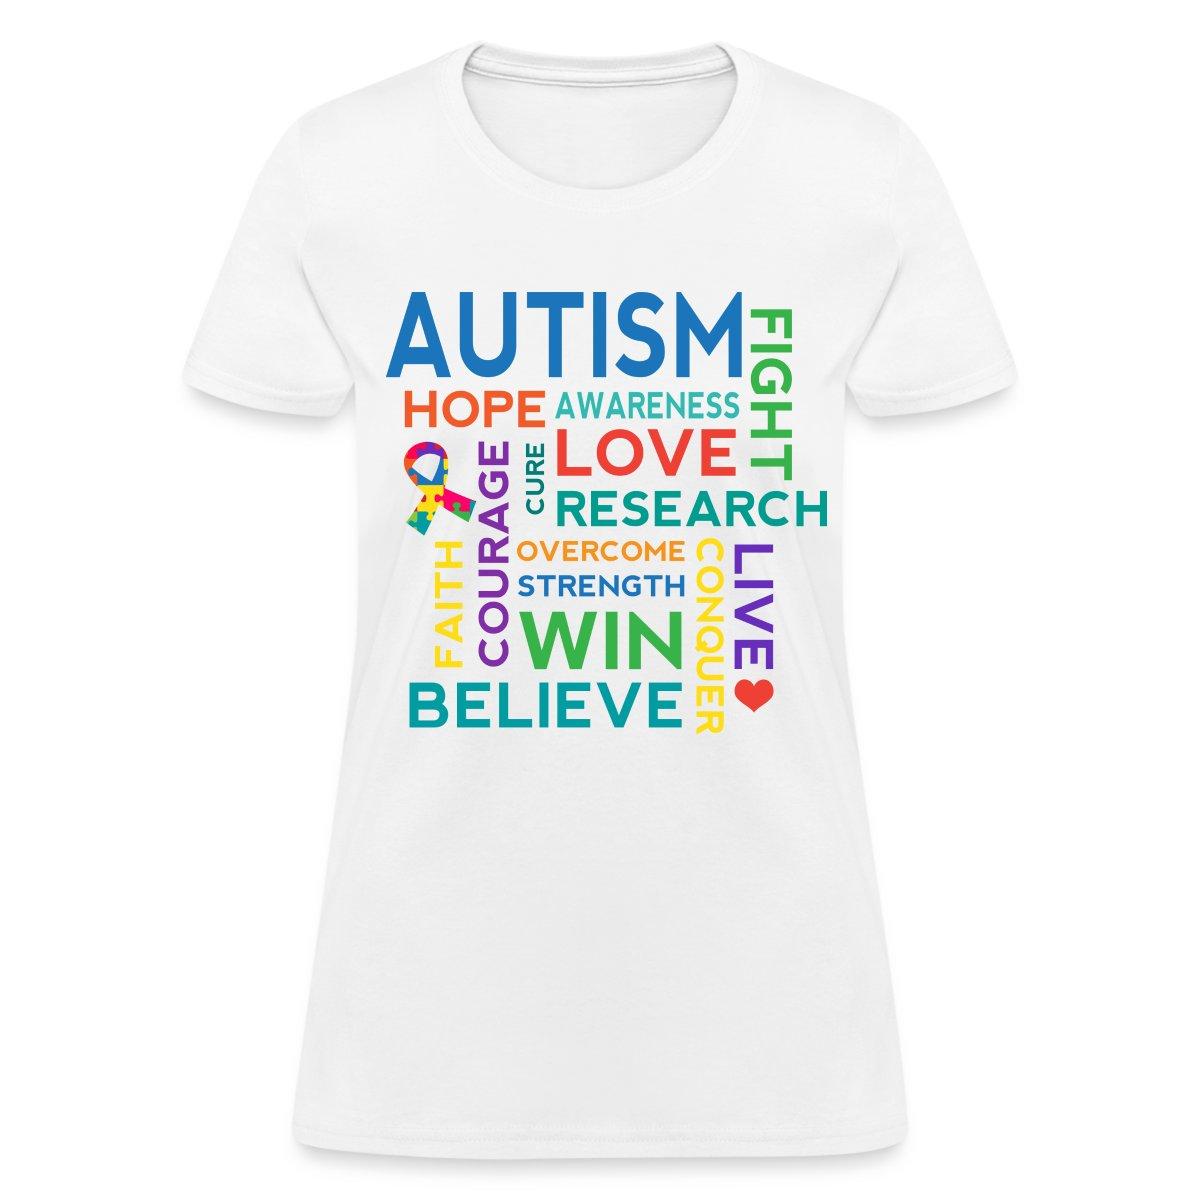 Autism Awareness Word Cloud Women 39 S T Shirt Ebay